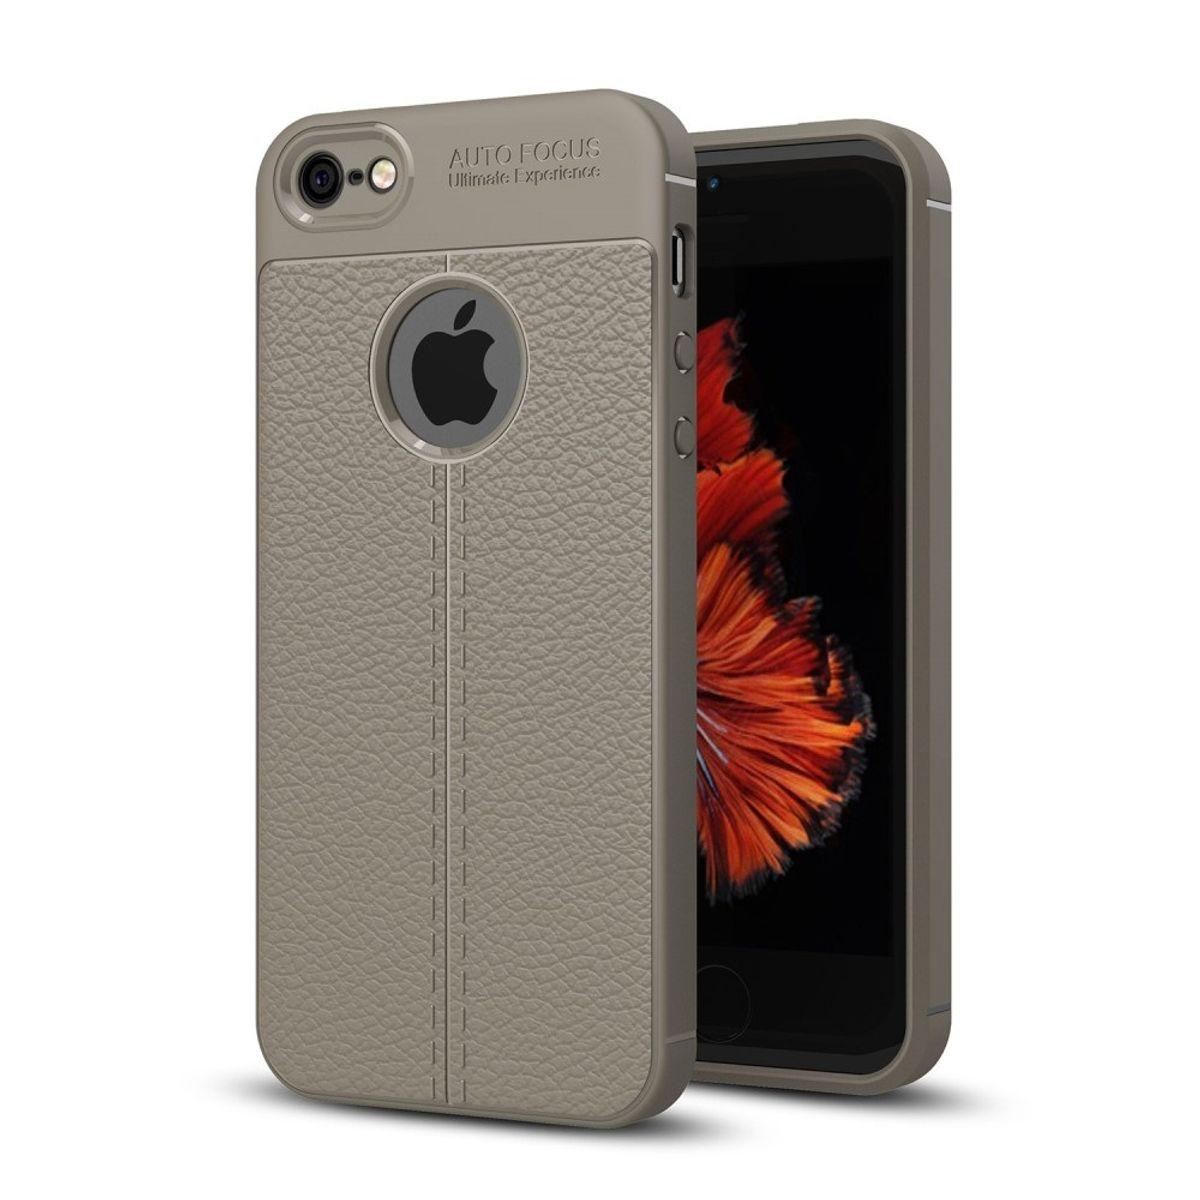 handy h lle schutz case f r apple iphone 5 5s se cover. Black Bedroom Furniture Sets. Home Design Ideas